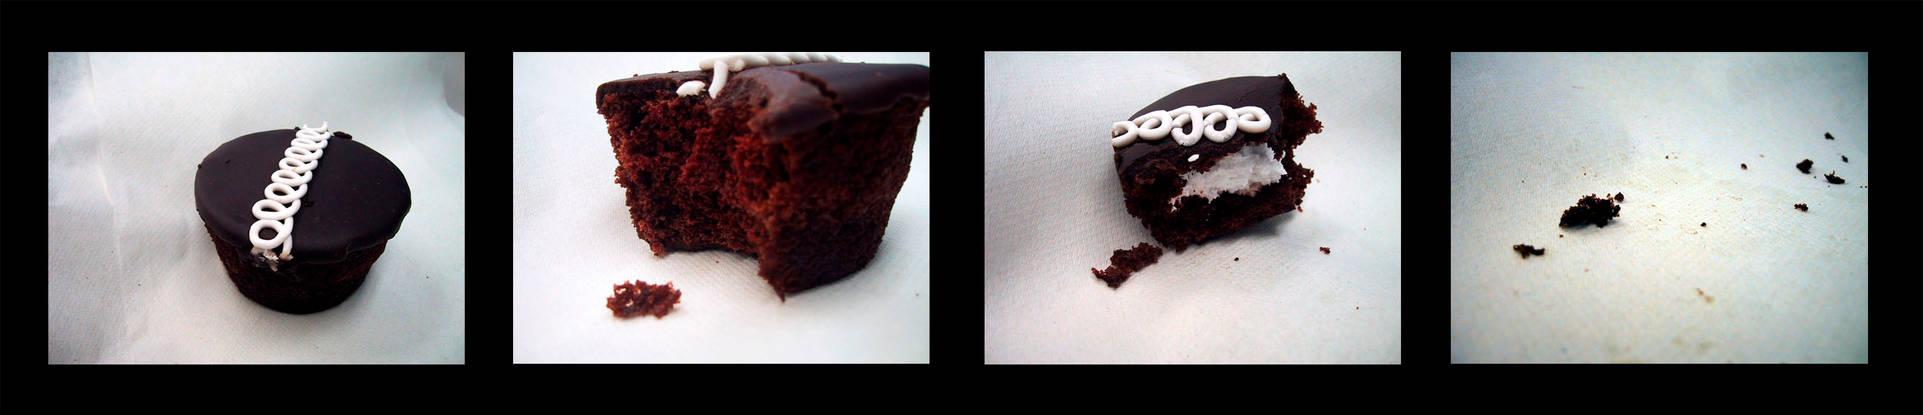 The Cupcake Saga